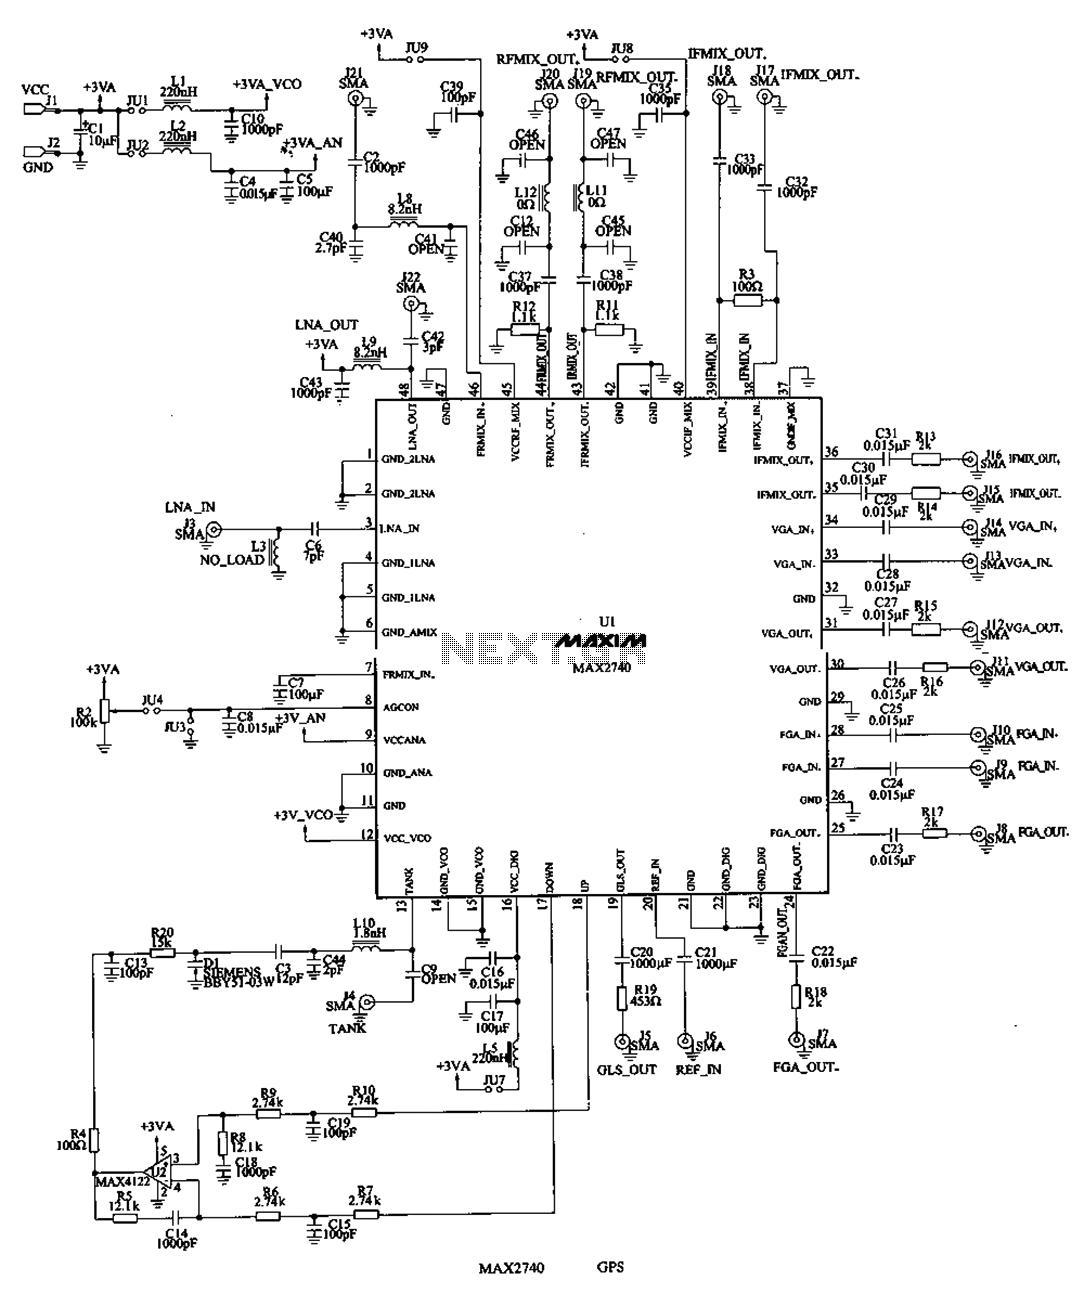 Gps circuit rf circuits nextgr f3397tu3978397e397 gps circuits diagram description gps support kit diagram description gps support kit